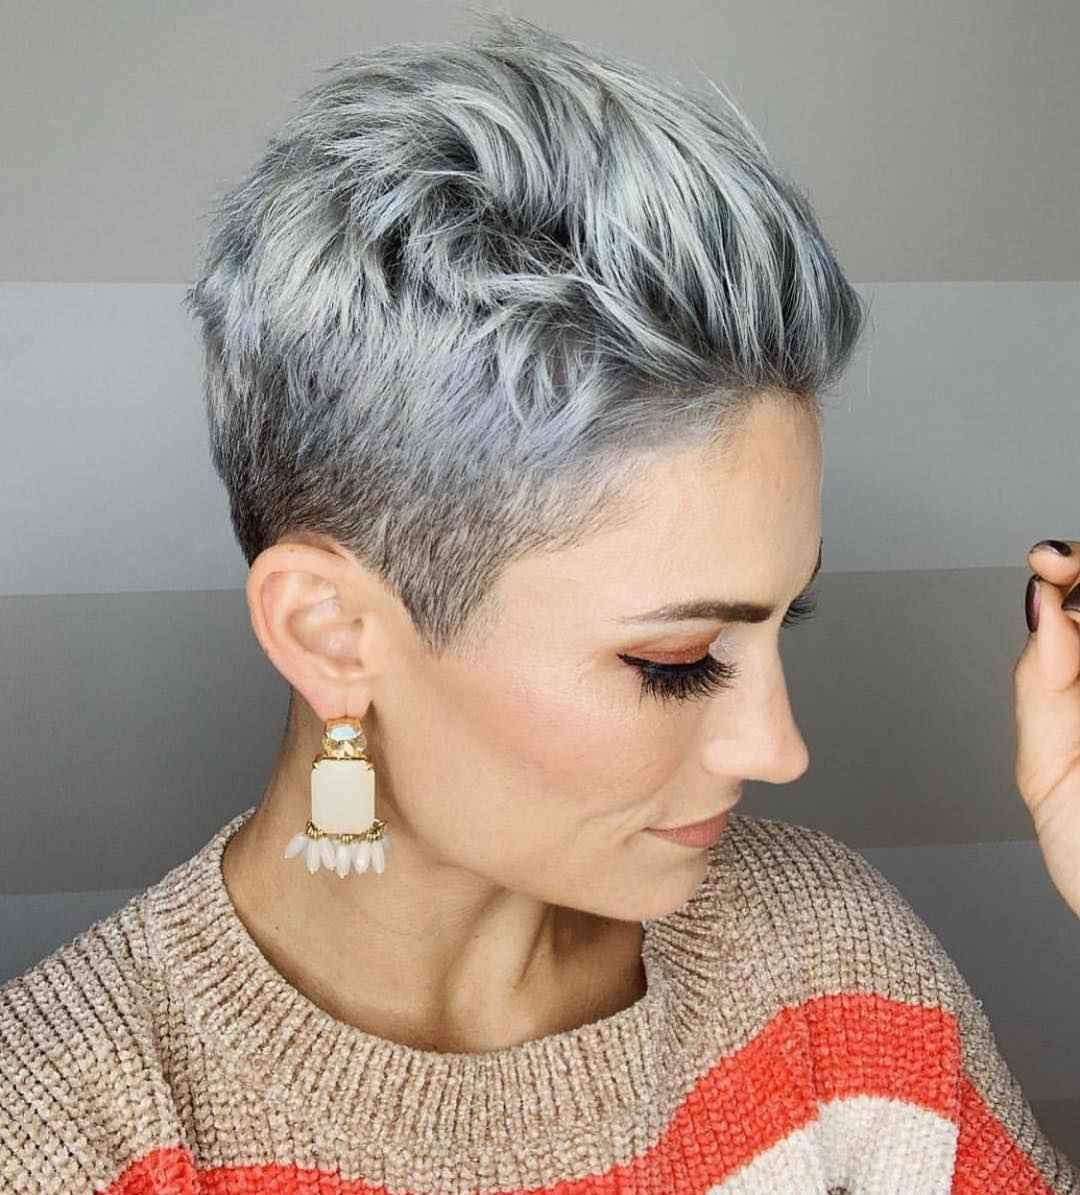 женские стрижки с выбритыми висками 2020 фото_23